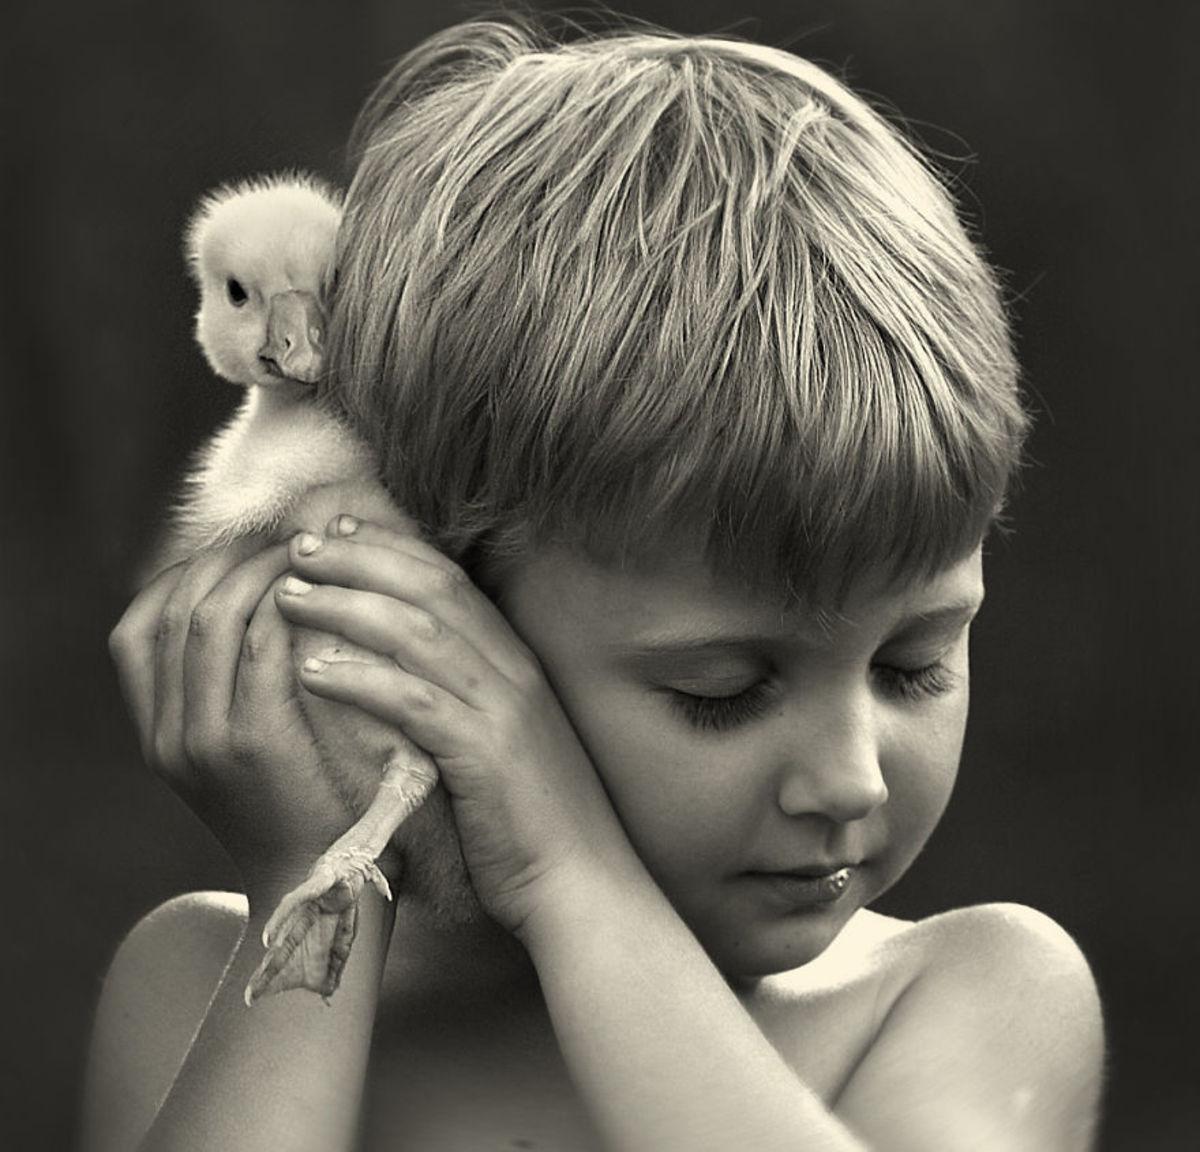 Portraits of children with baby animals